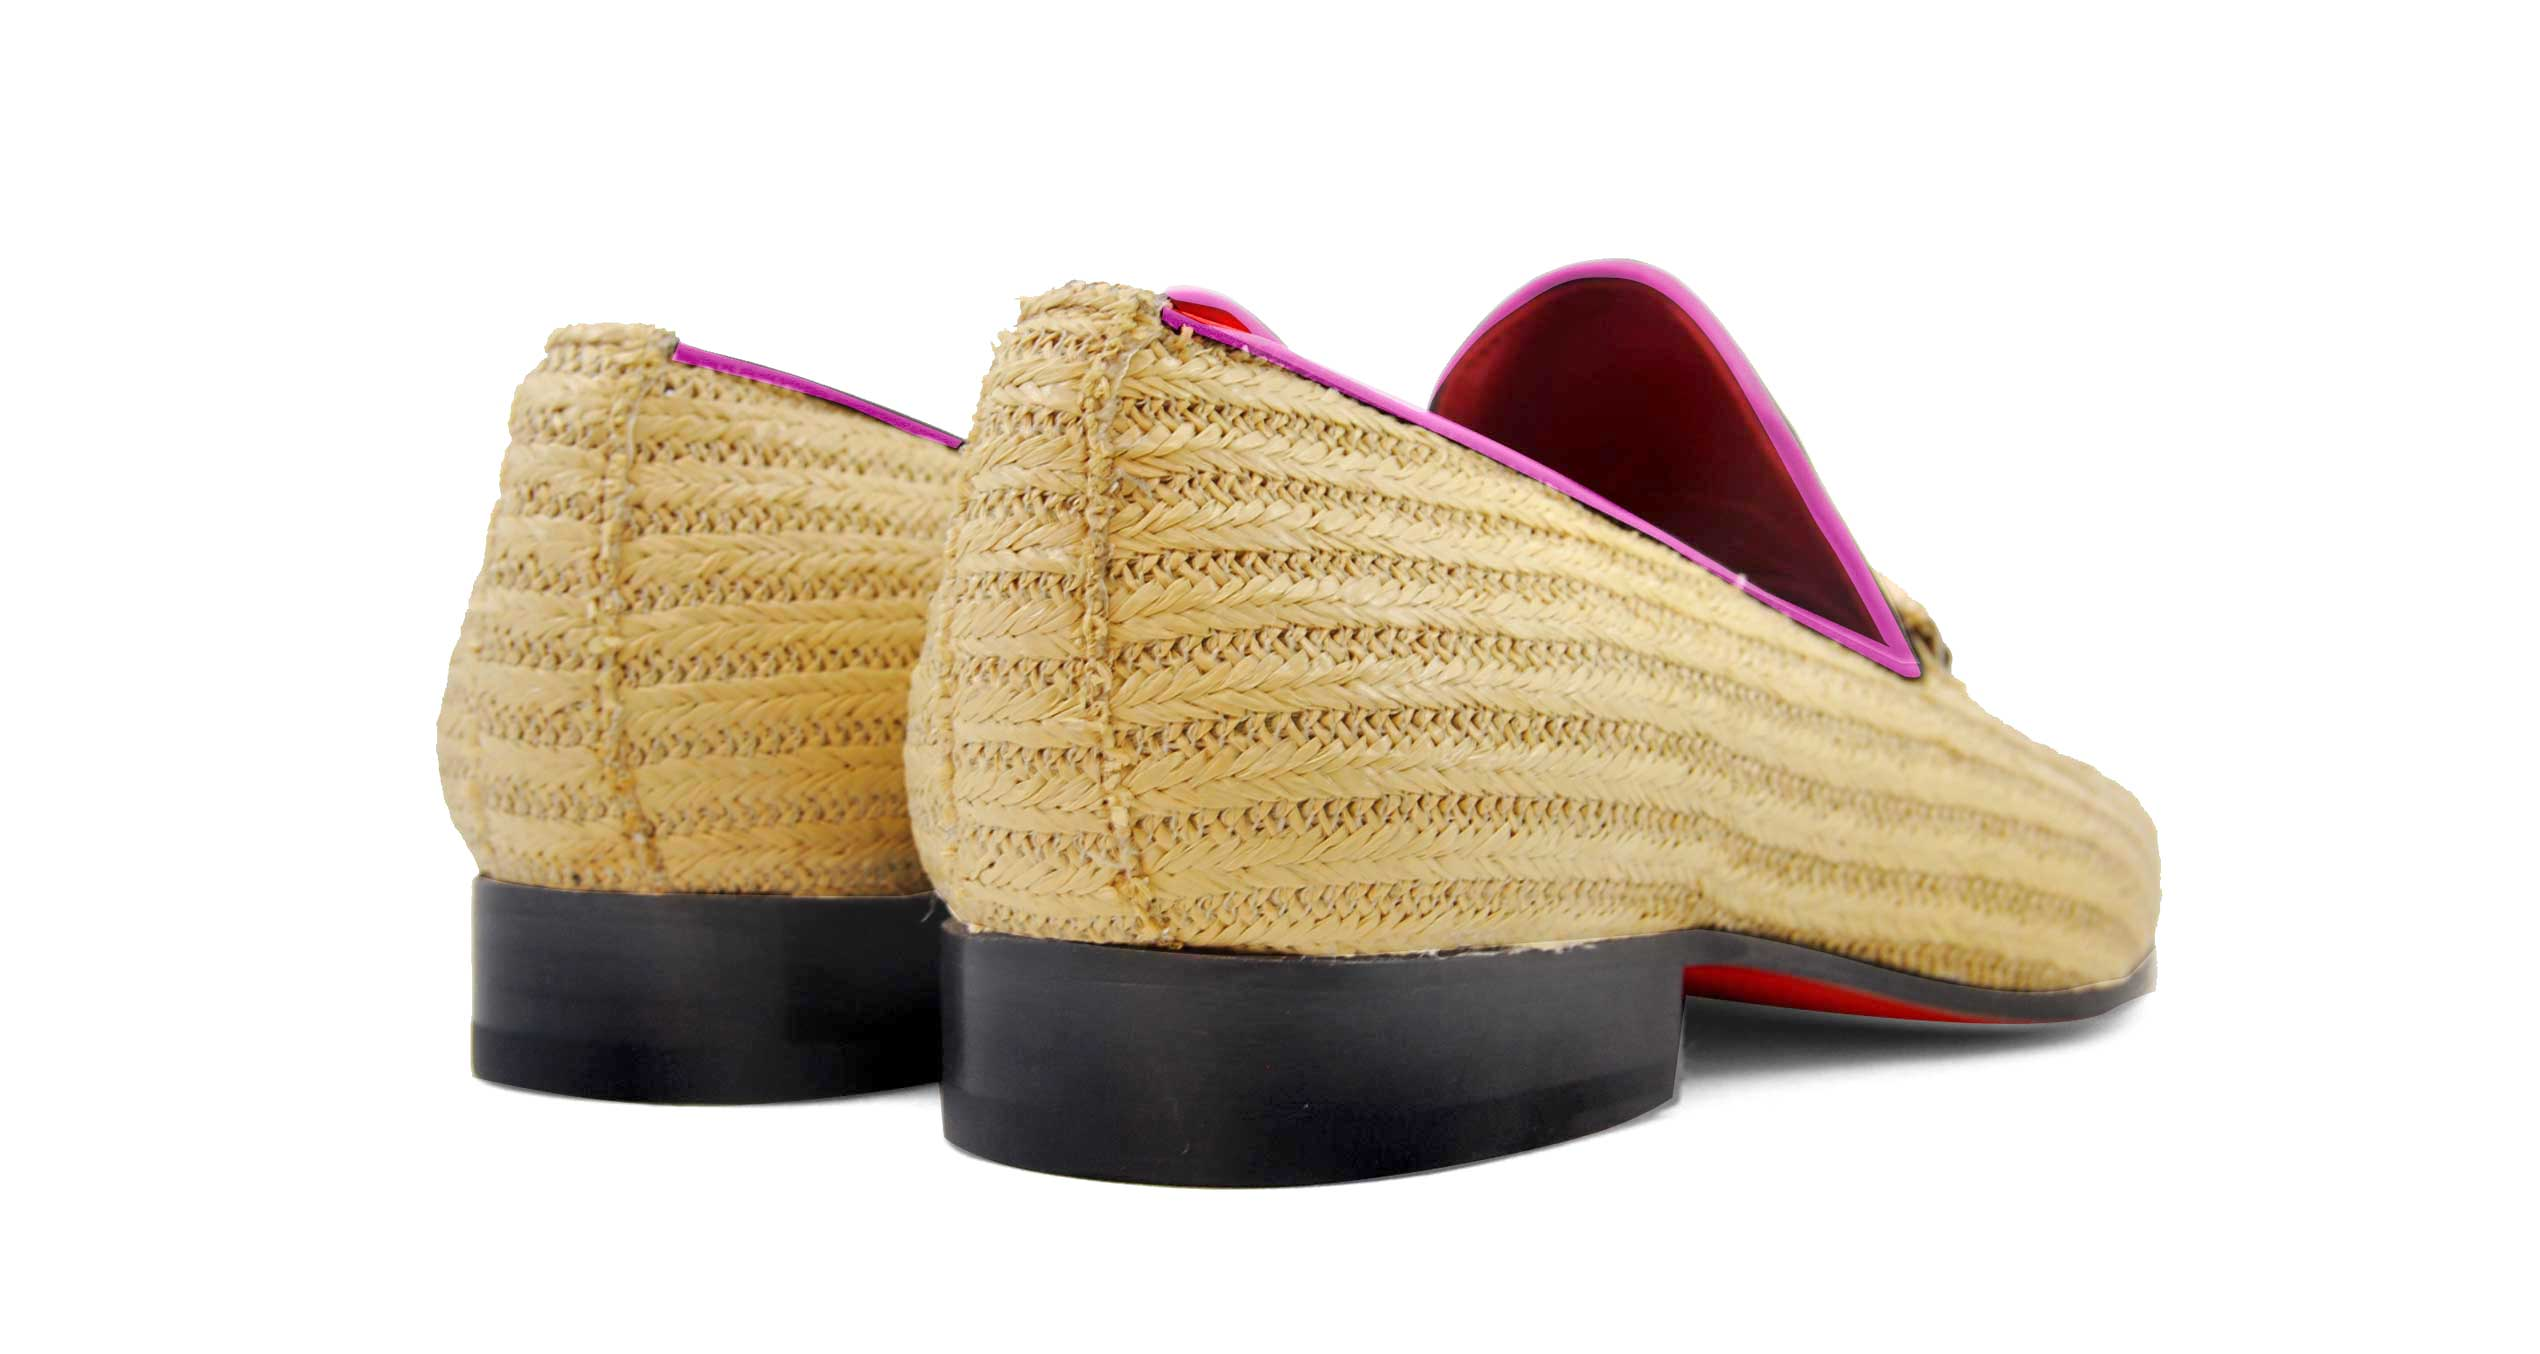 Foto 4 de Zapatos Palma Panameña Con Ribete Rosa